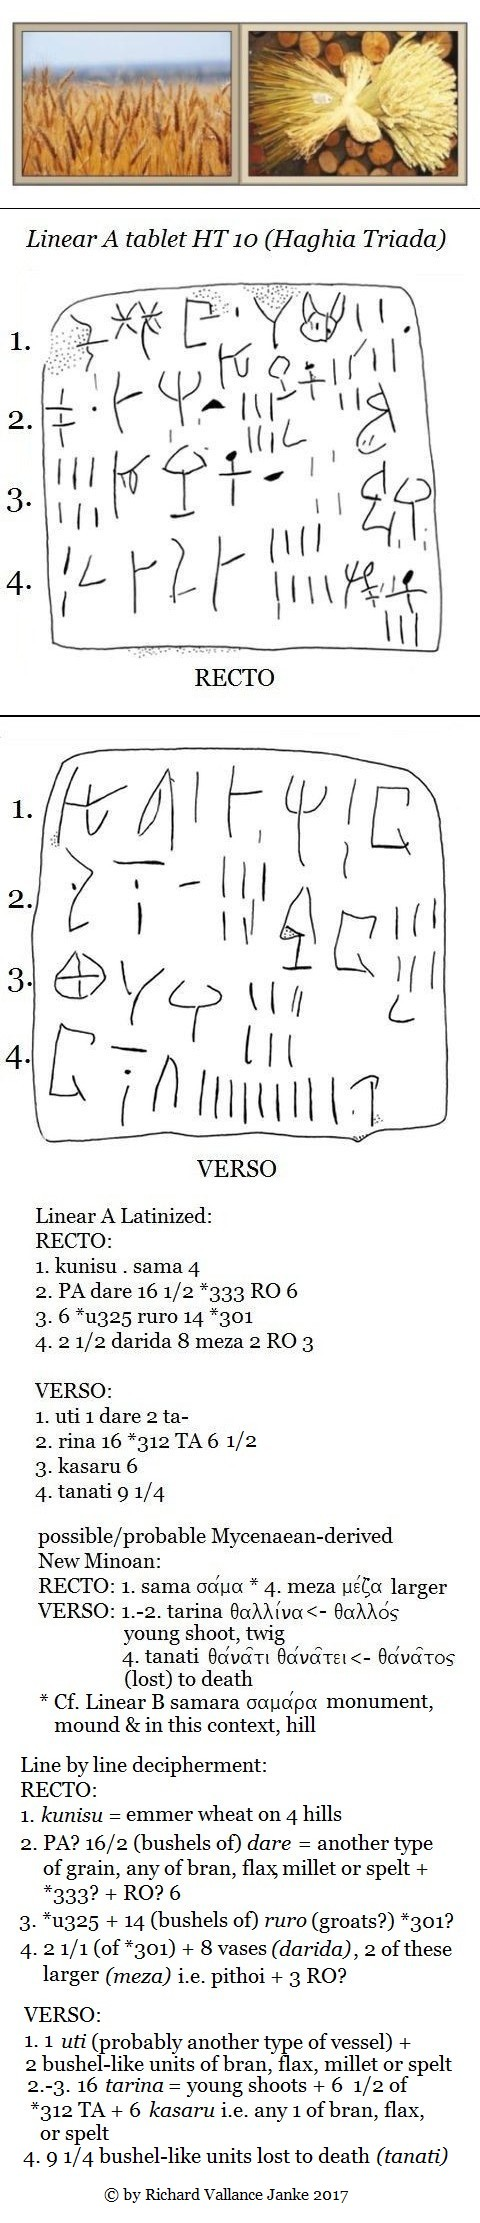 Linear A tablet HT 10 Haghia Triada dealing with several grain crops